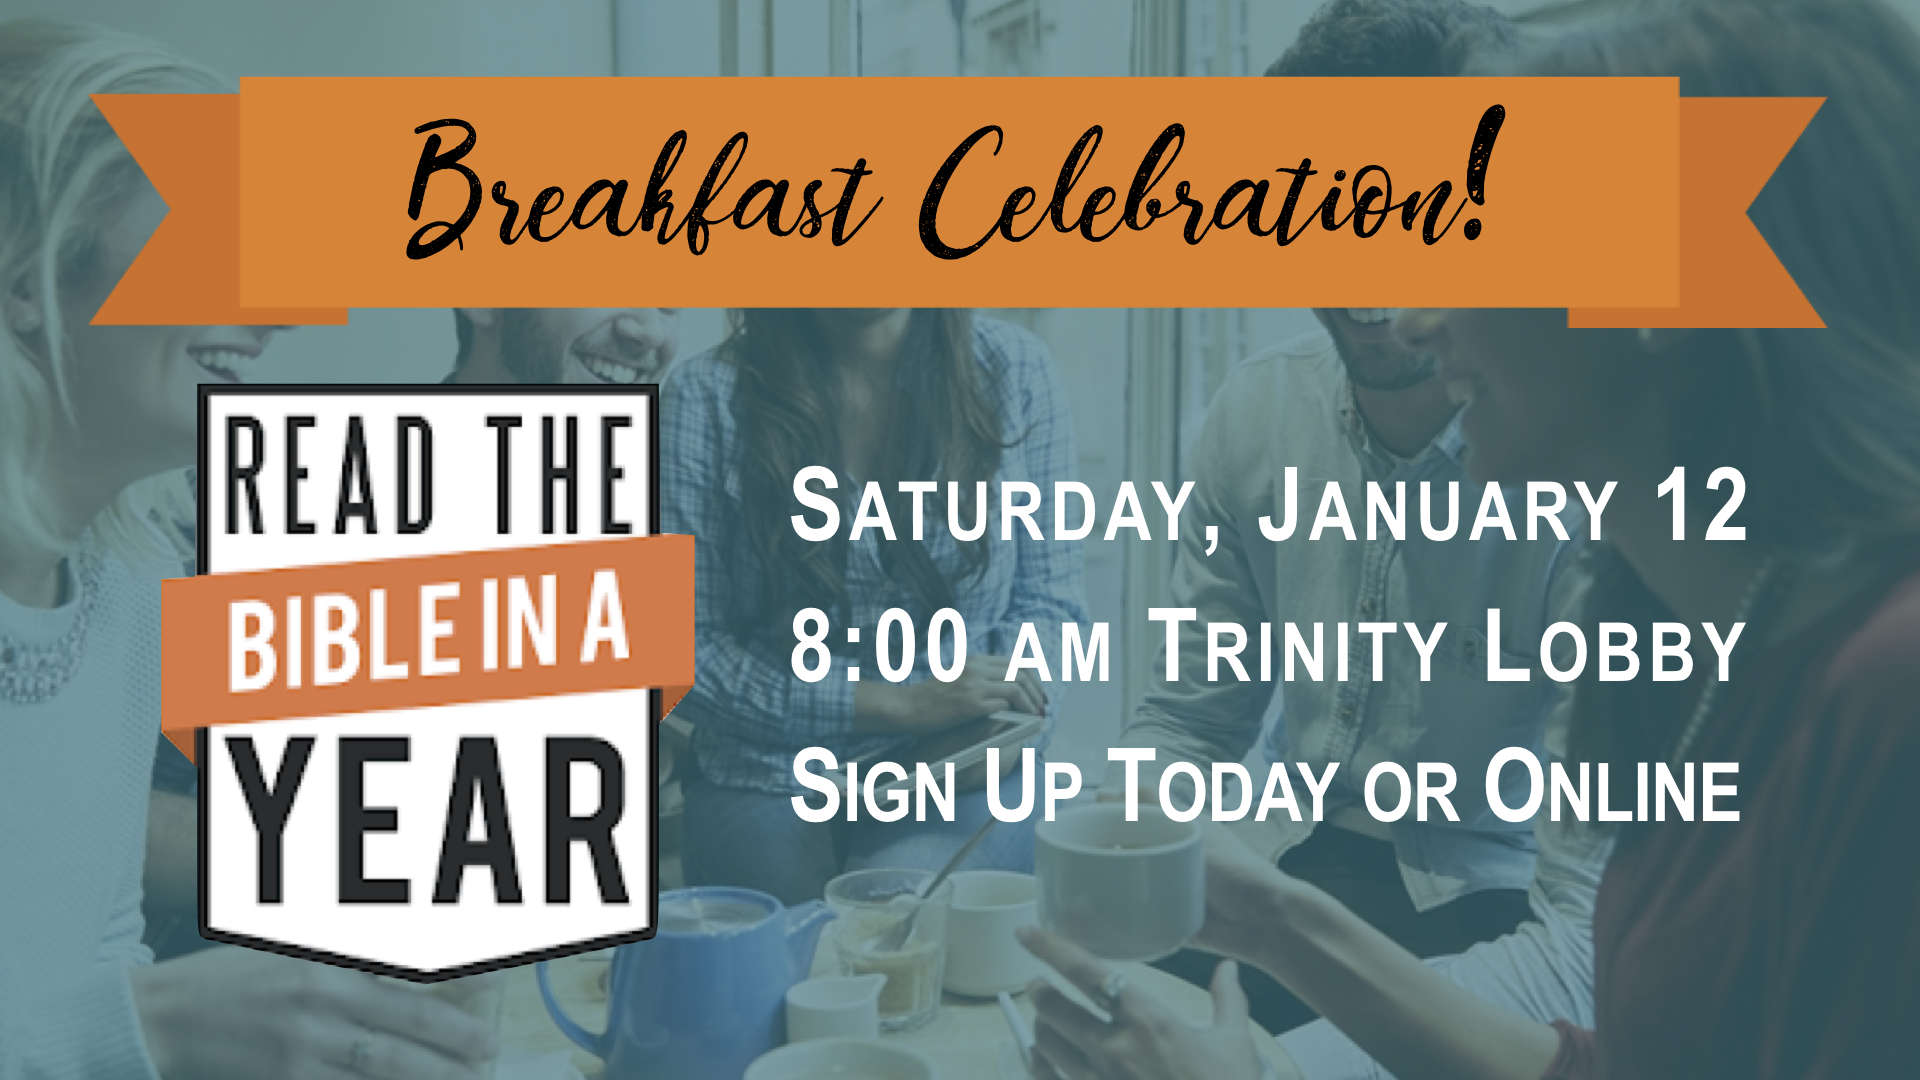 TCC Graphics - Breakfast:Bible Celebration.001.jpeg